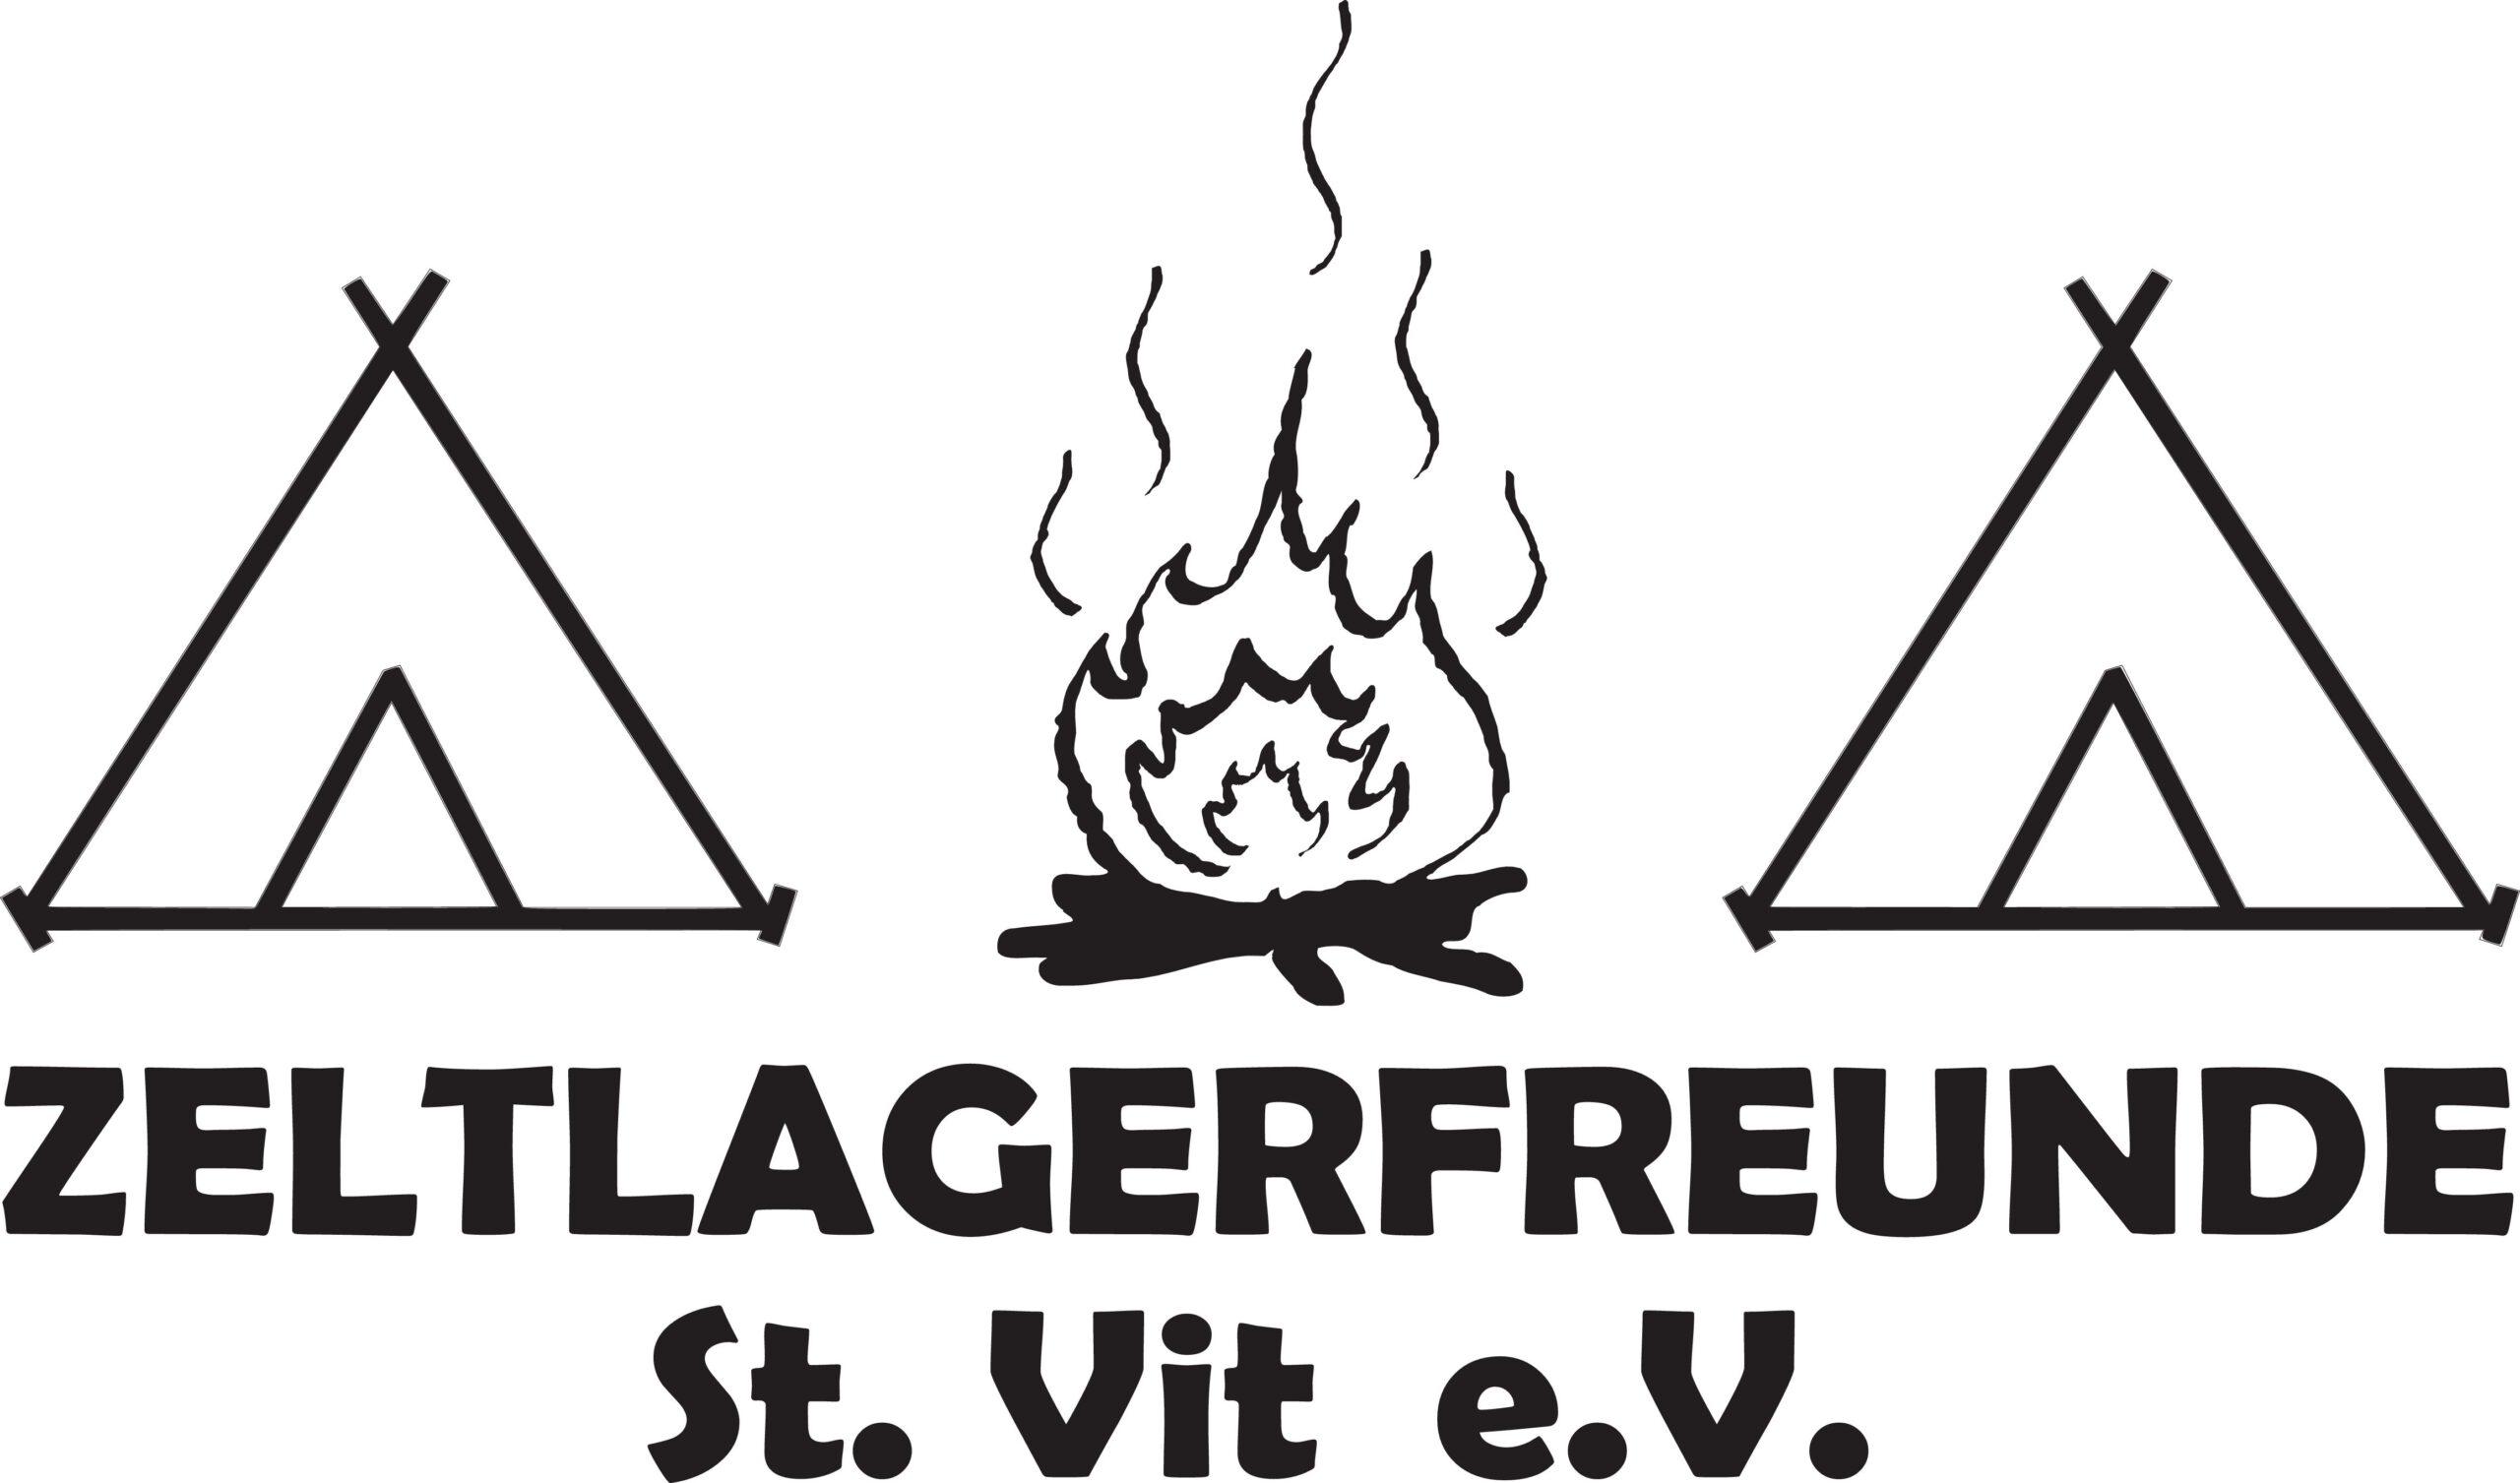 Zeltlagerfreunde St. Vit e.V. Logo